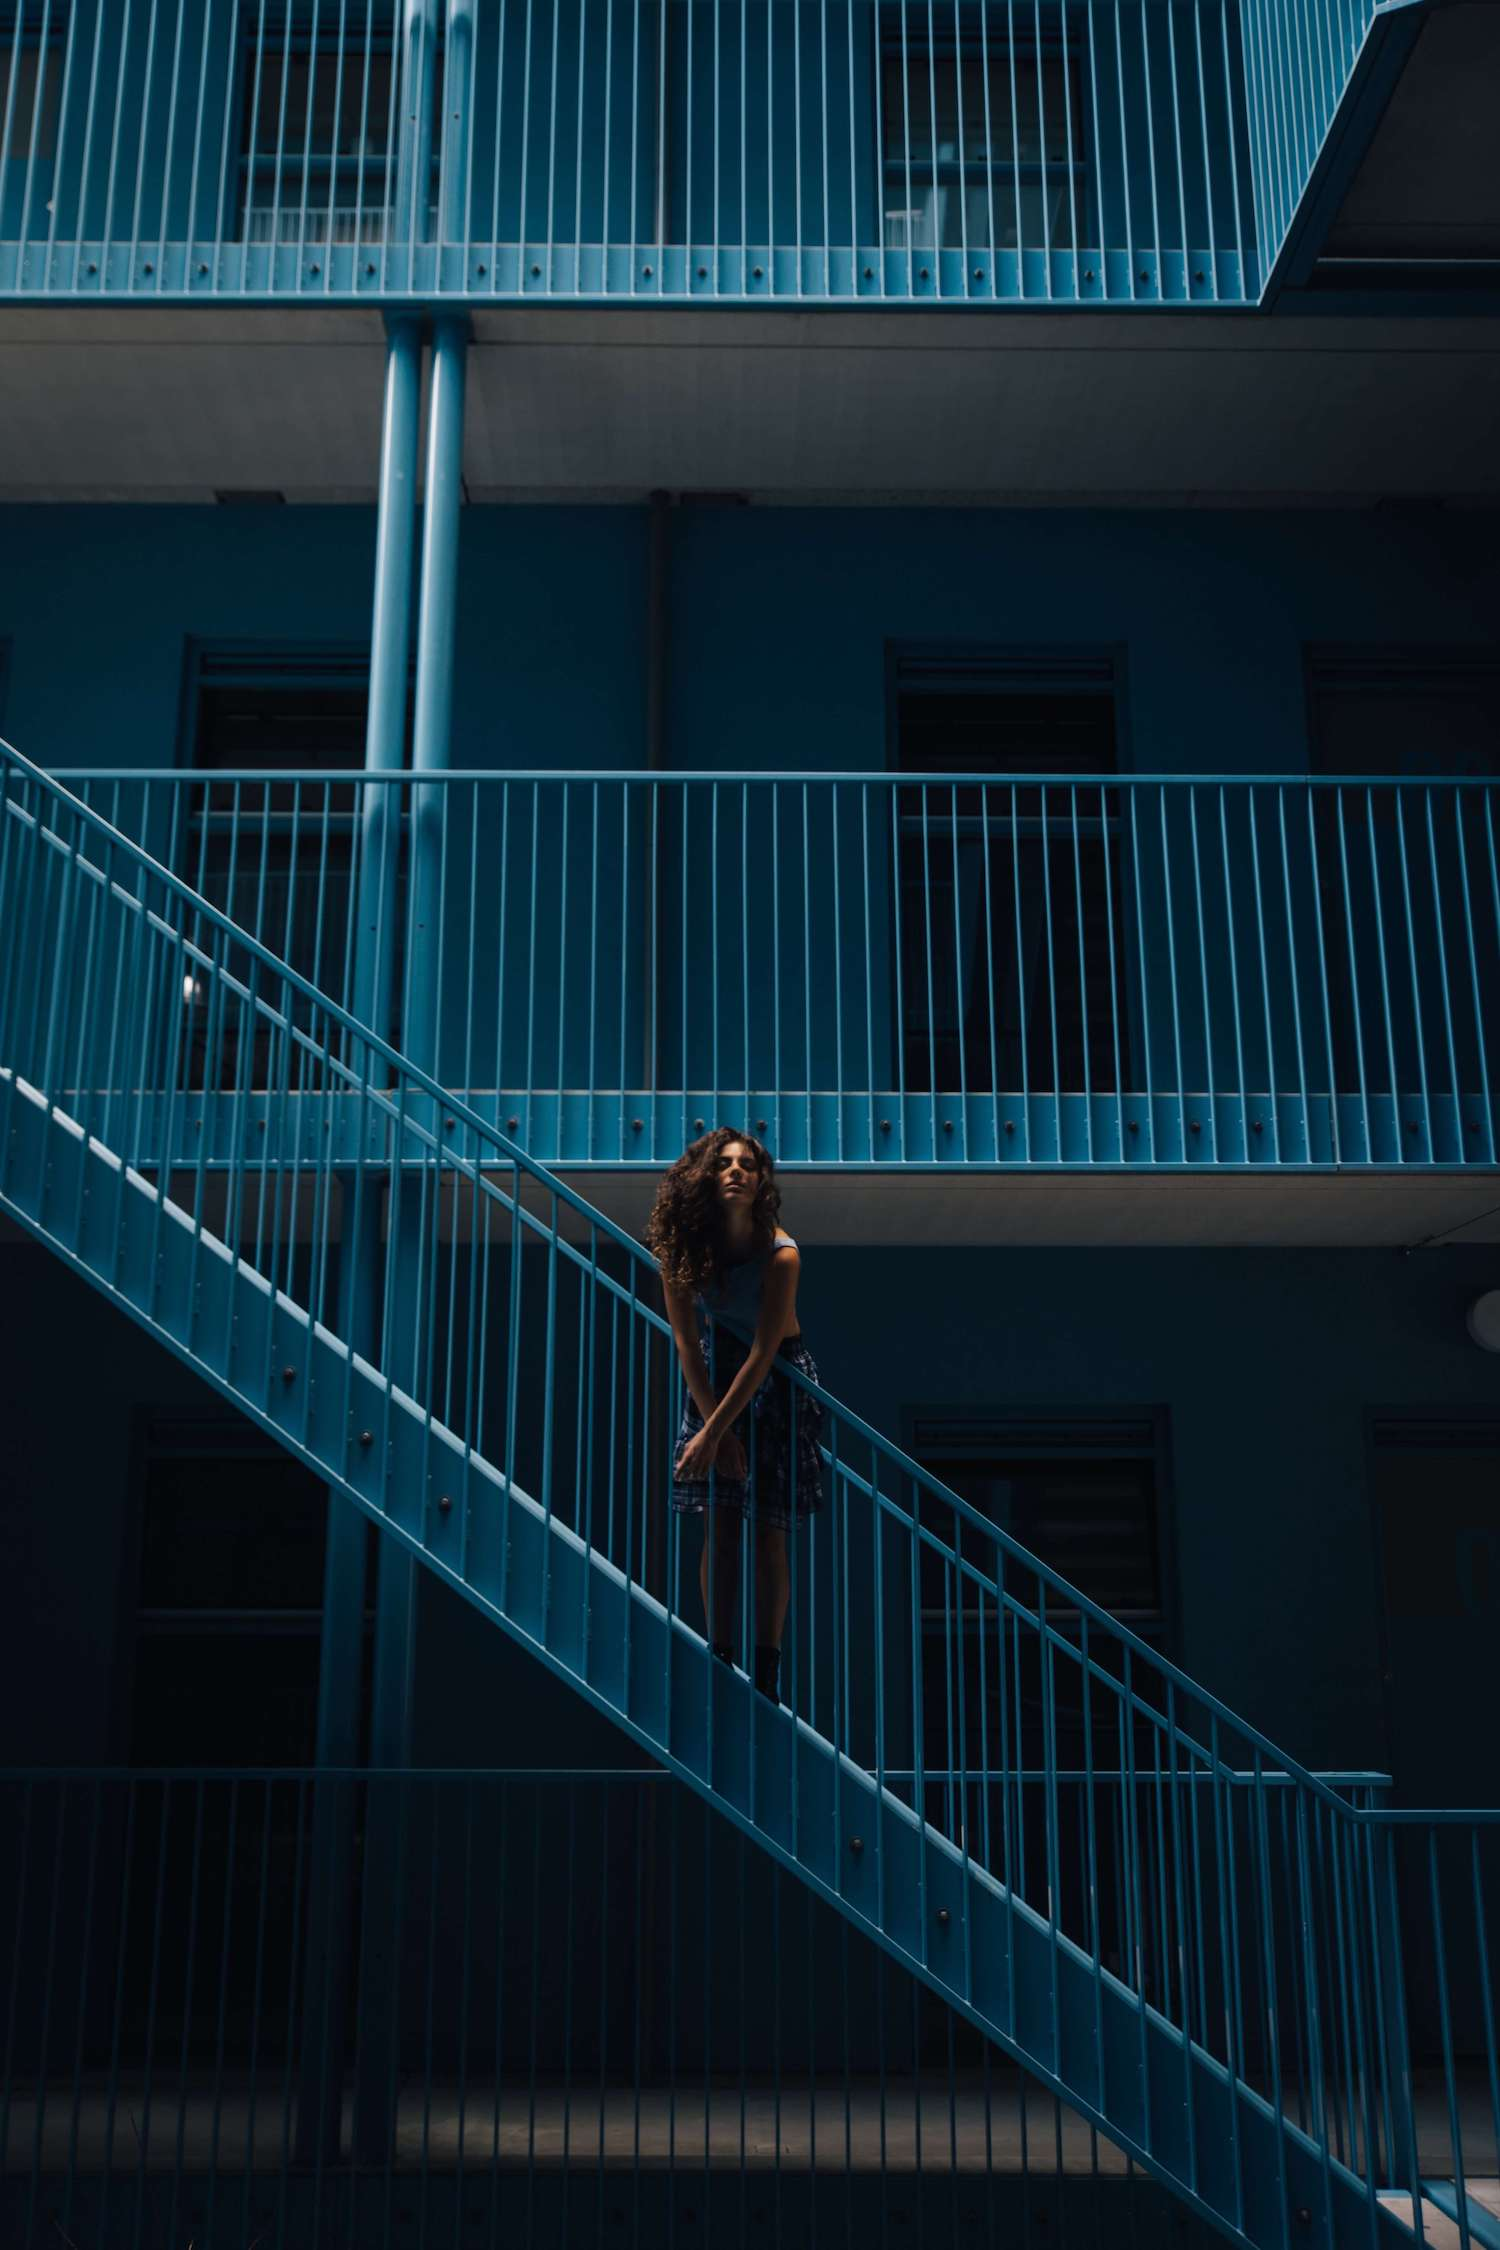 Model in a blue minimalistic building.